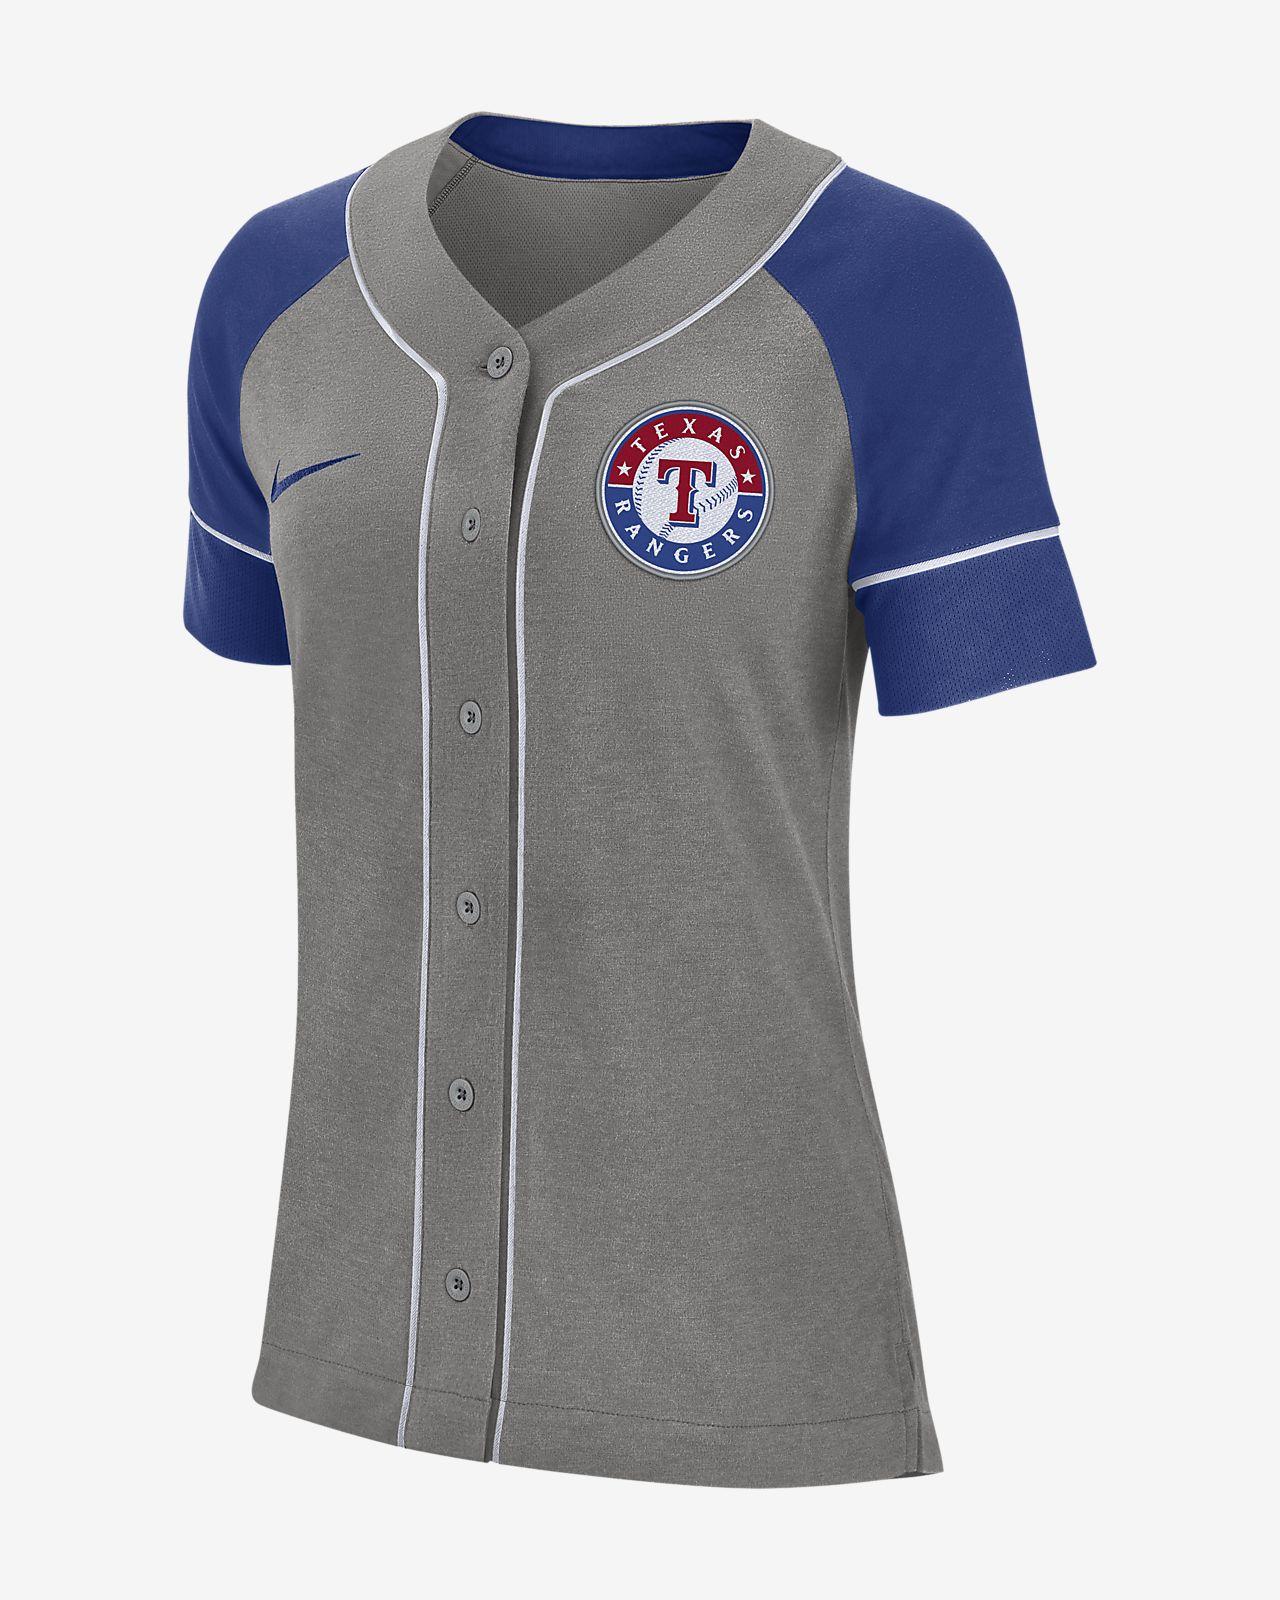 a09a94d92a75 Nike Dri-FIT (MLB Rangers) Women s Baseball Jersey. Nike.com